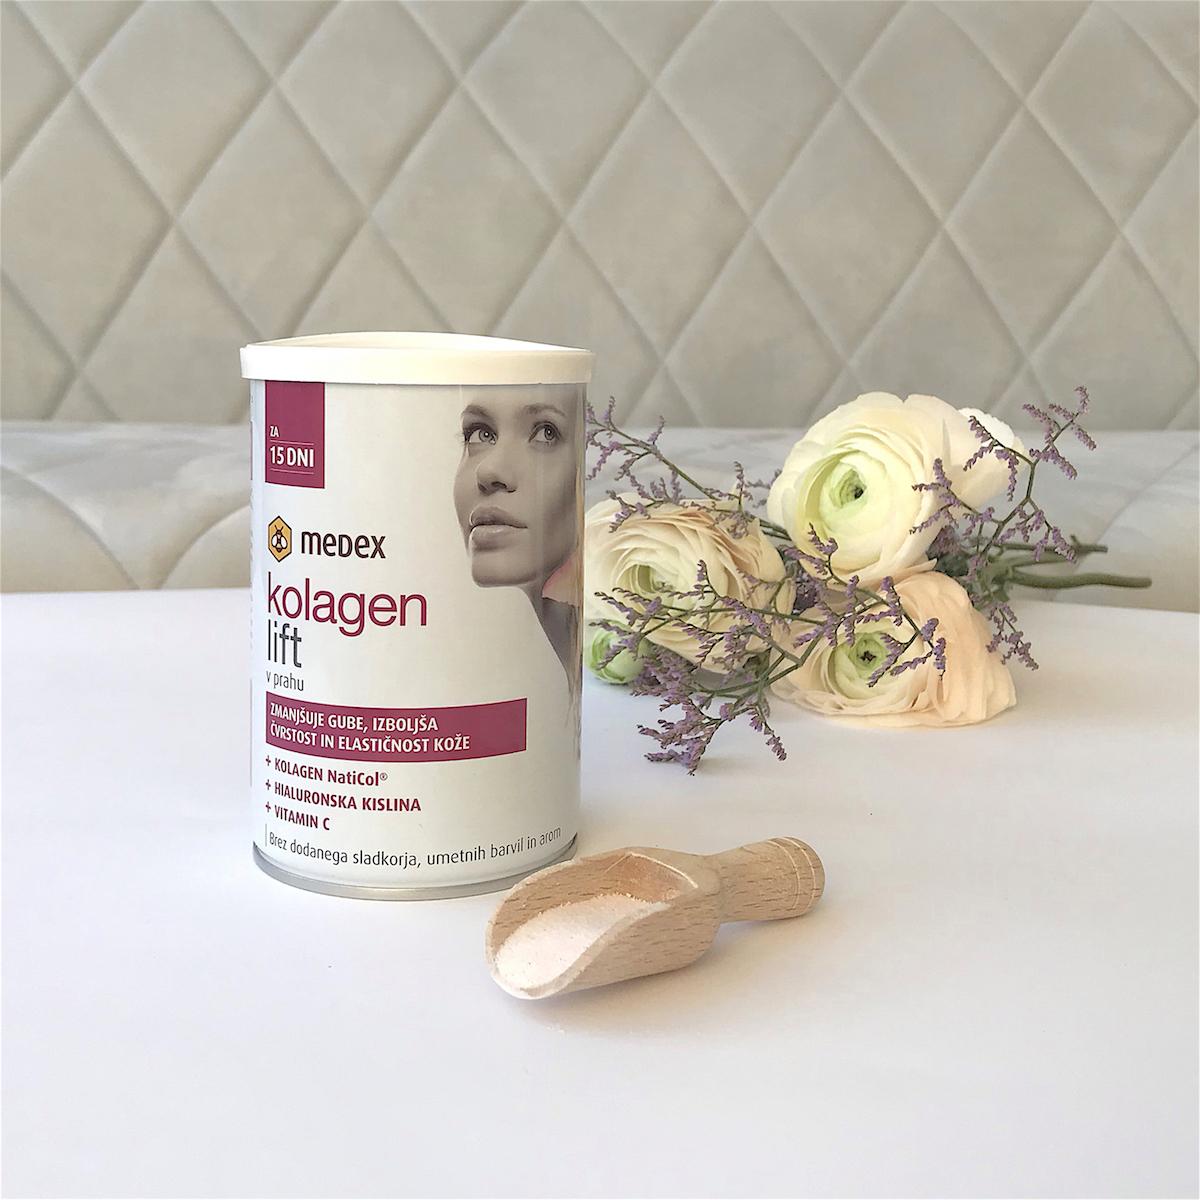 medex kolagen kolagenlift v prahu beautyfullblog